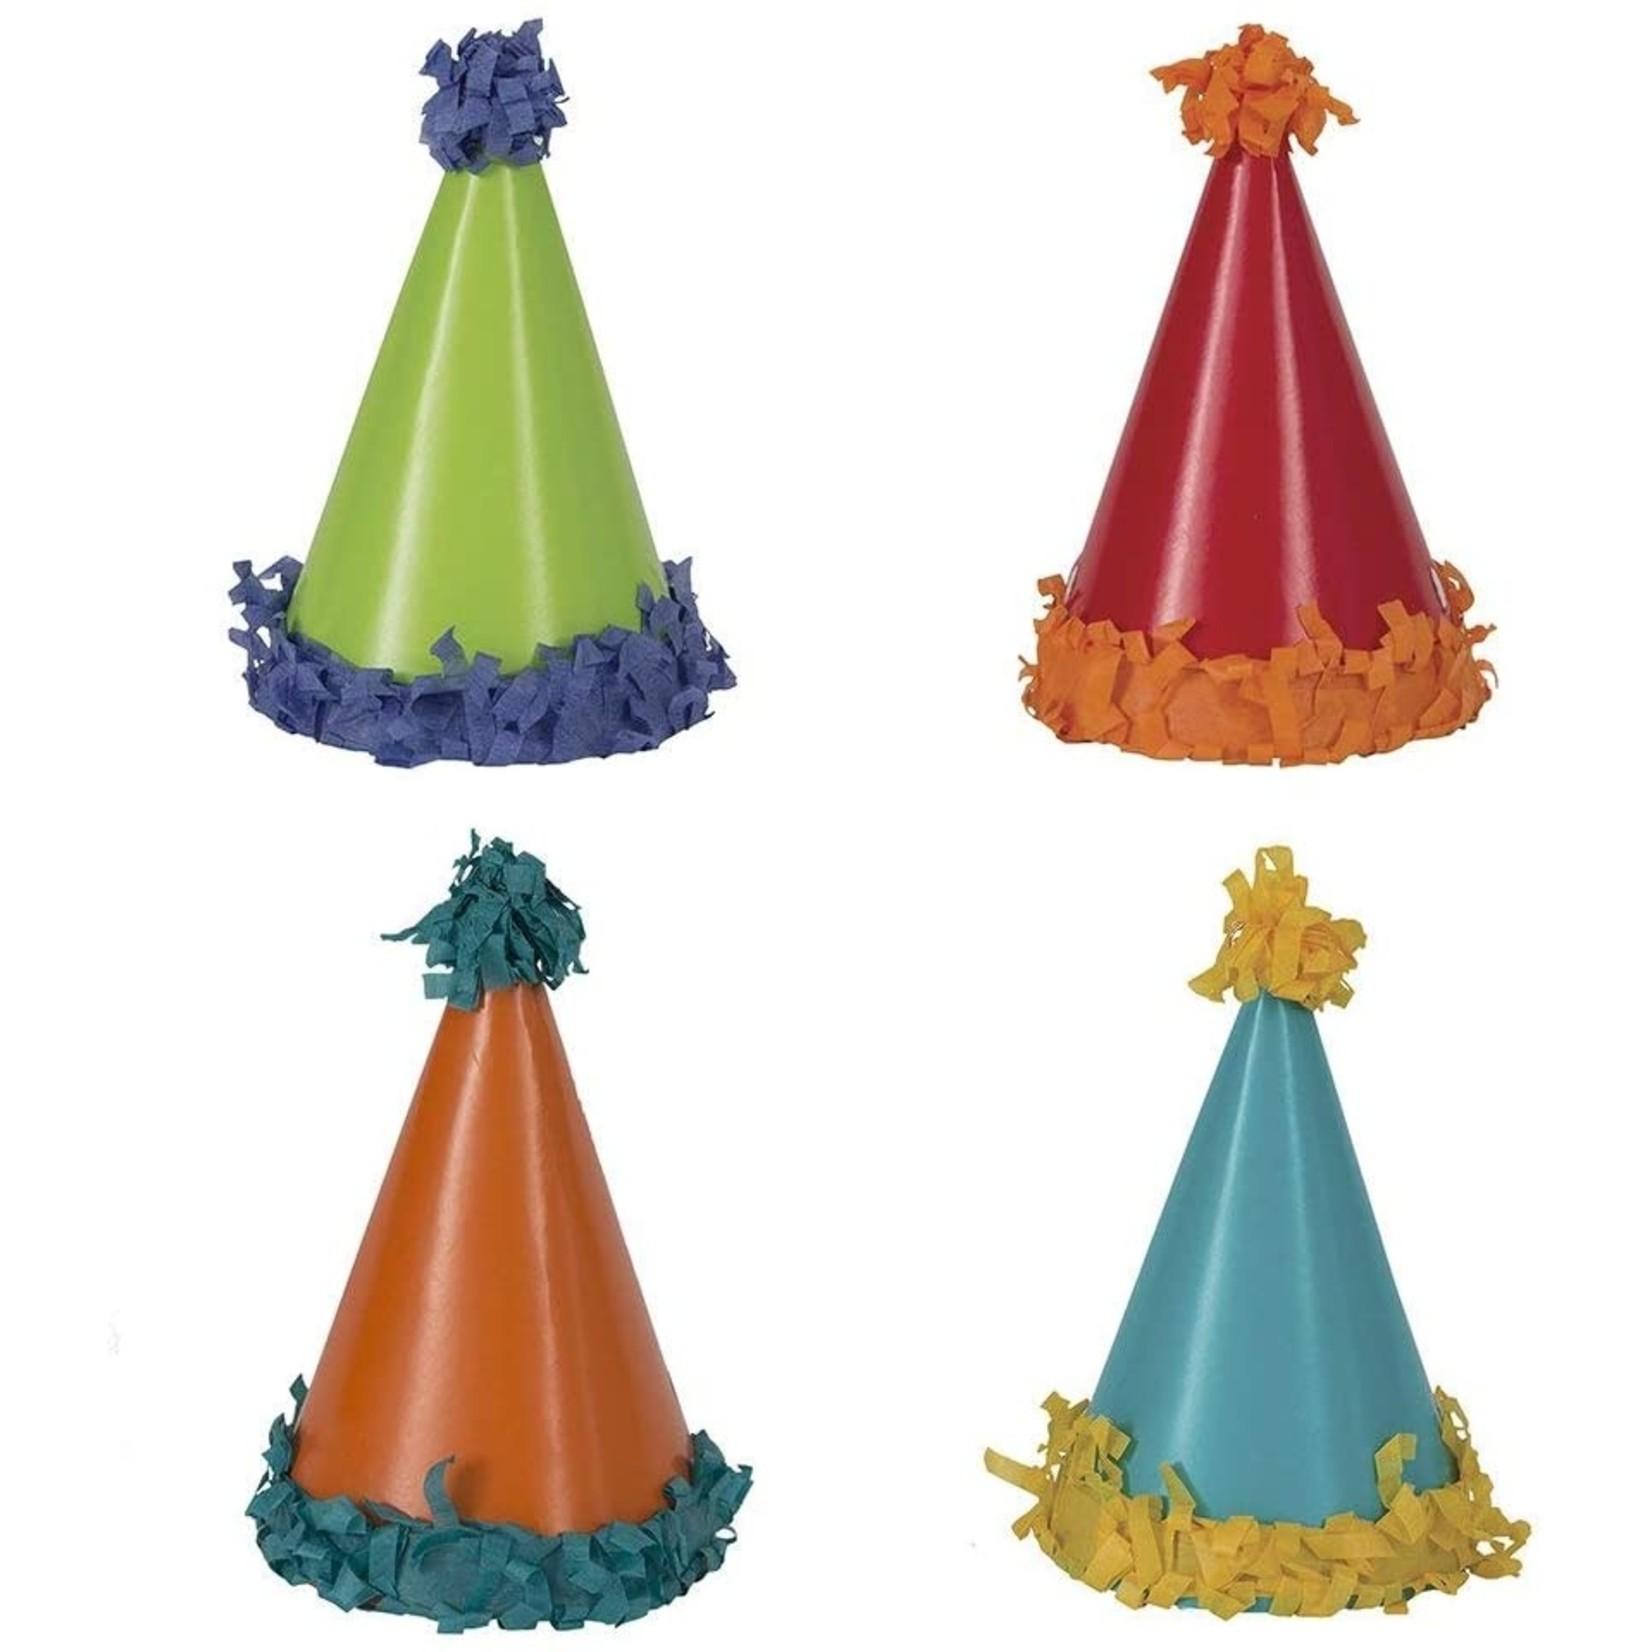 3D Garland -  Pom Pom Mini Hat - 7ft